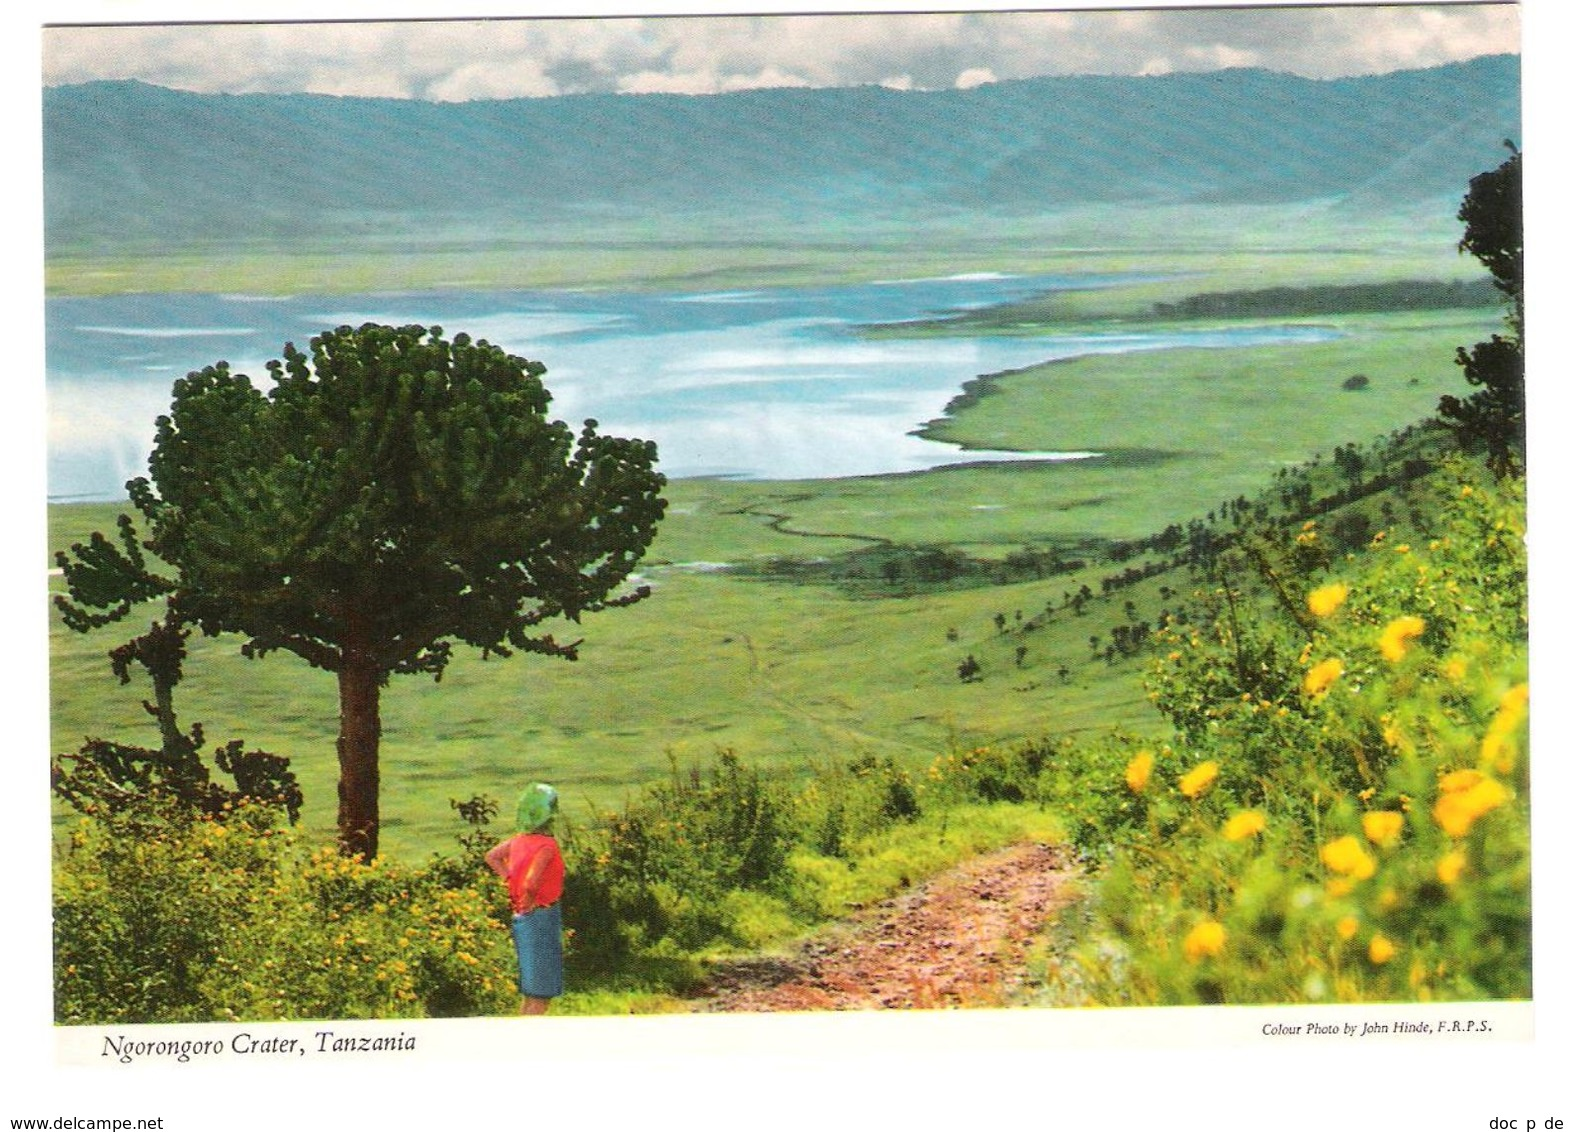 Africa - Tanzania - Ngorongoro Crater - Tansania